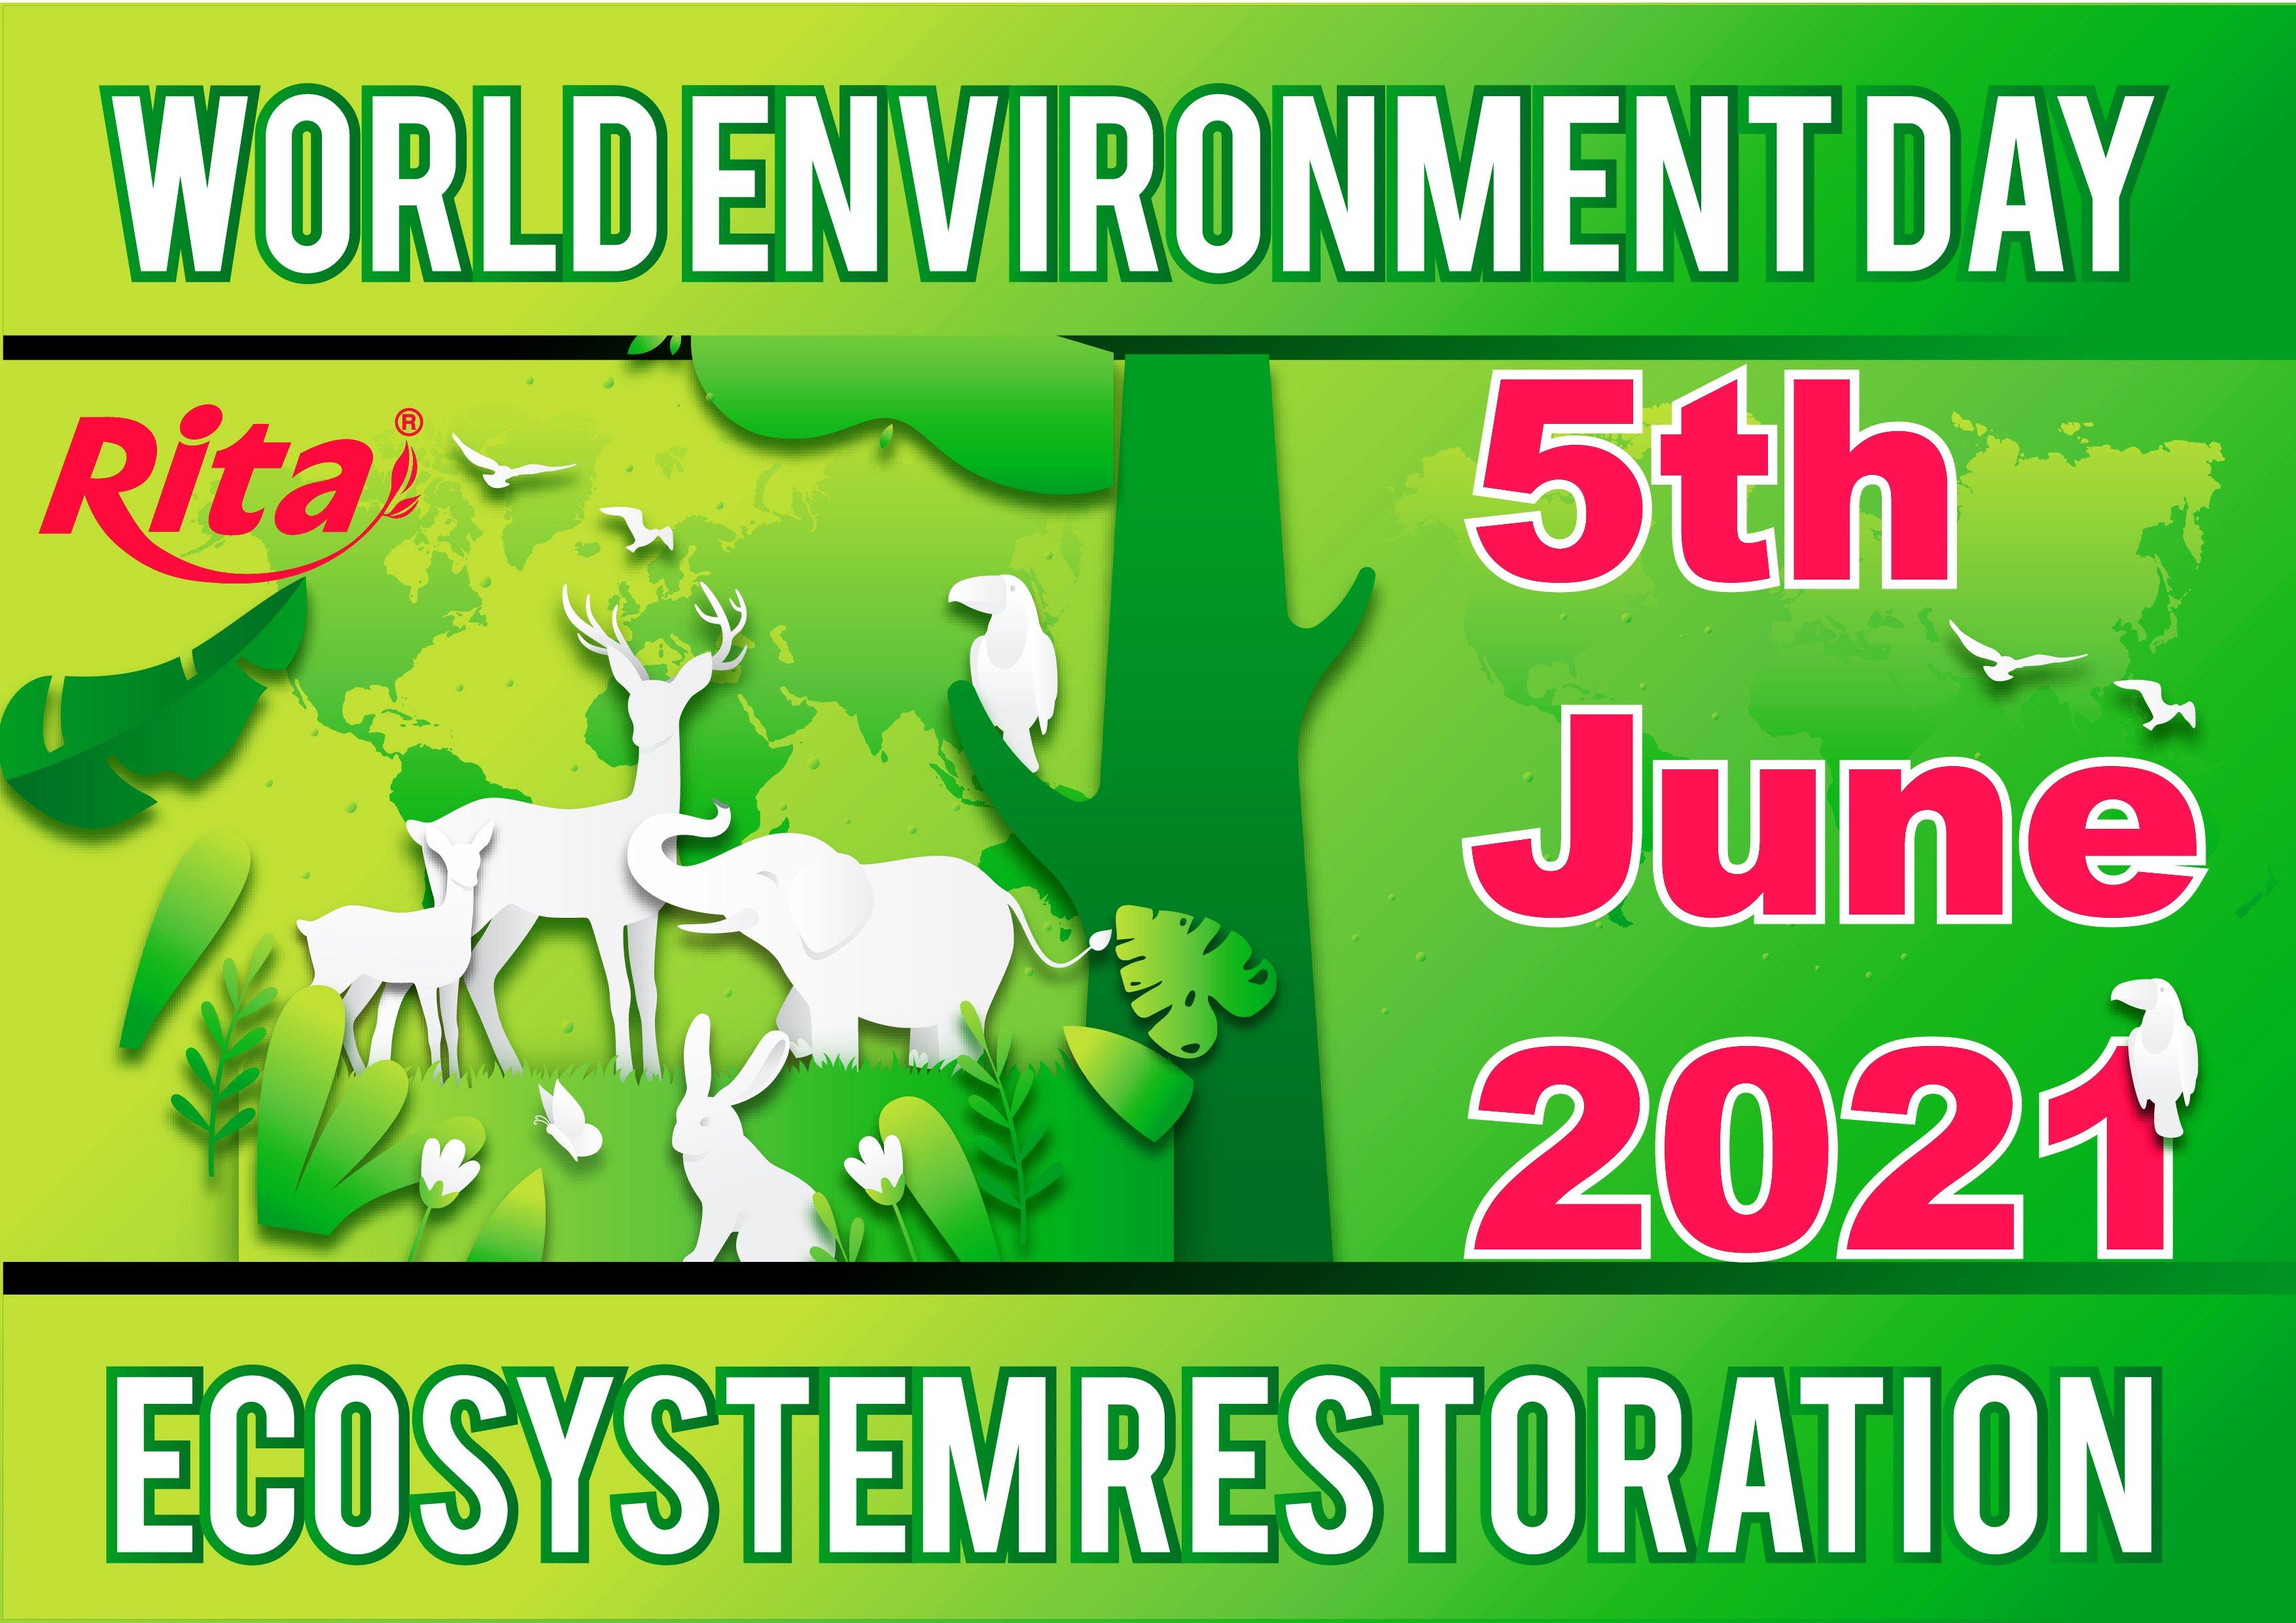 WORLD ENVIRONMENT DAY 2021 -  ECOSYSTEM RESTORATION